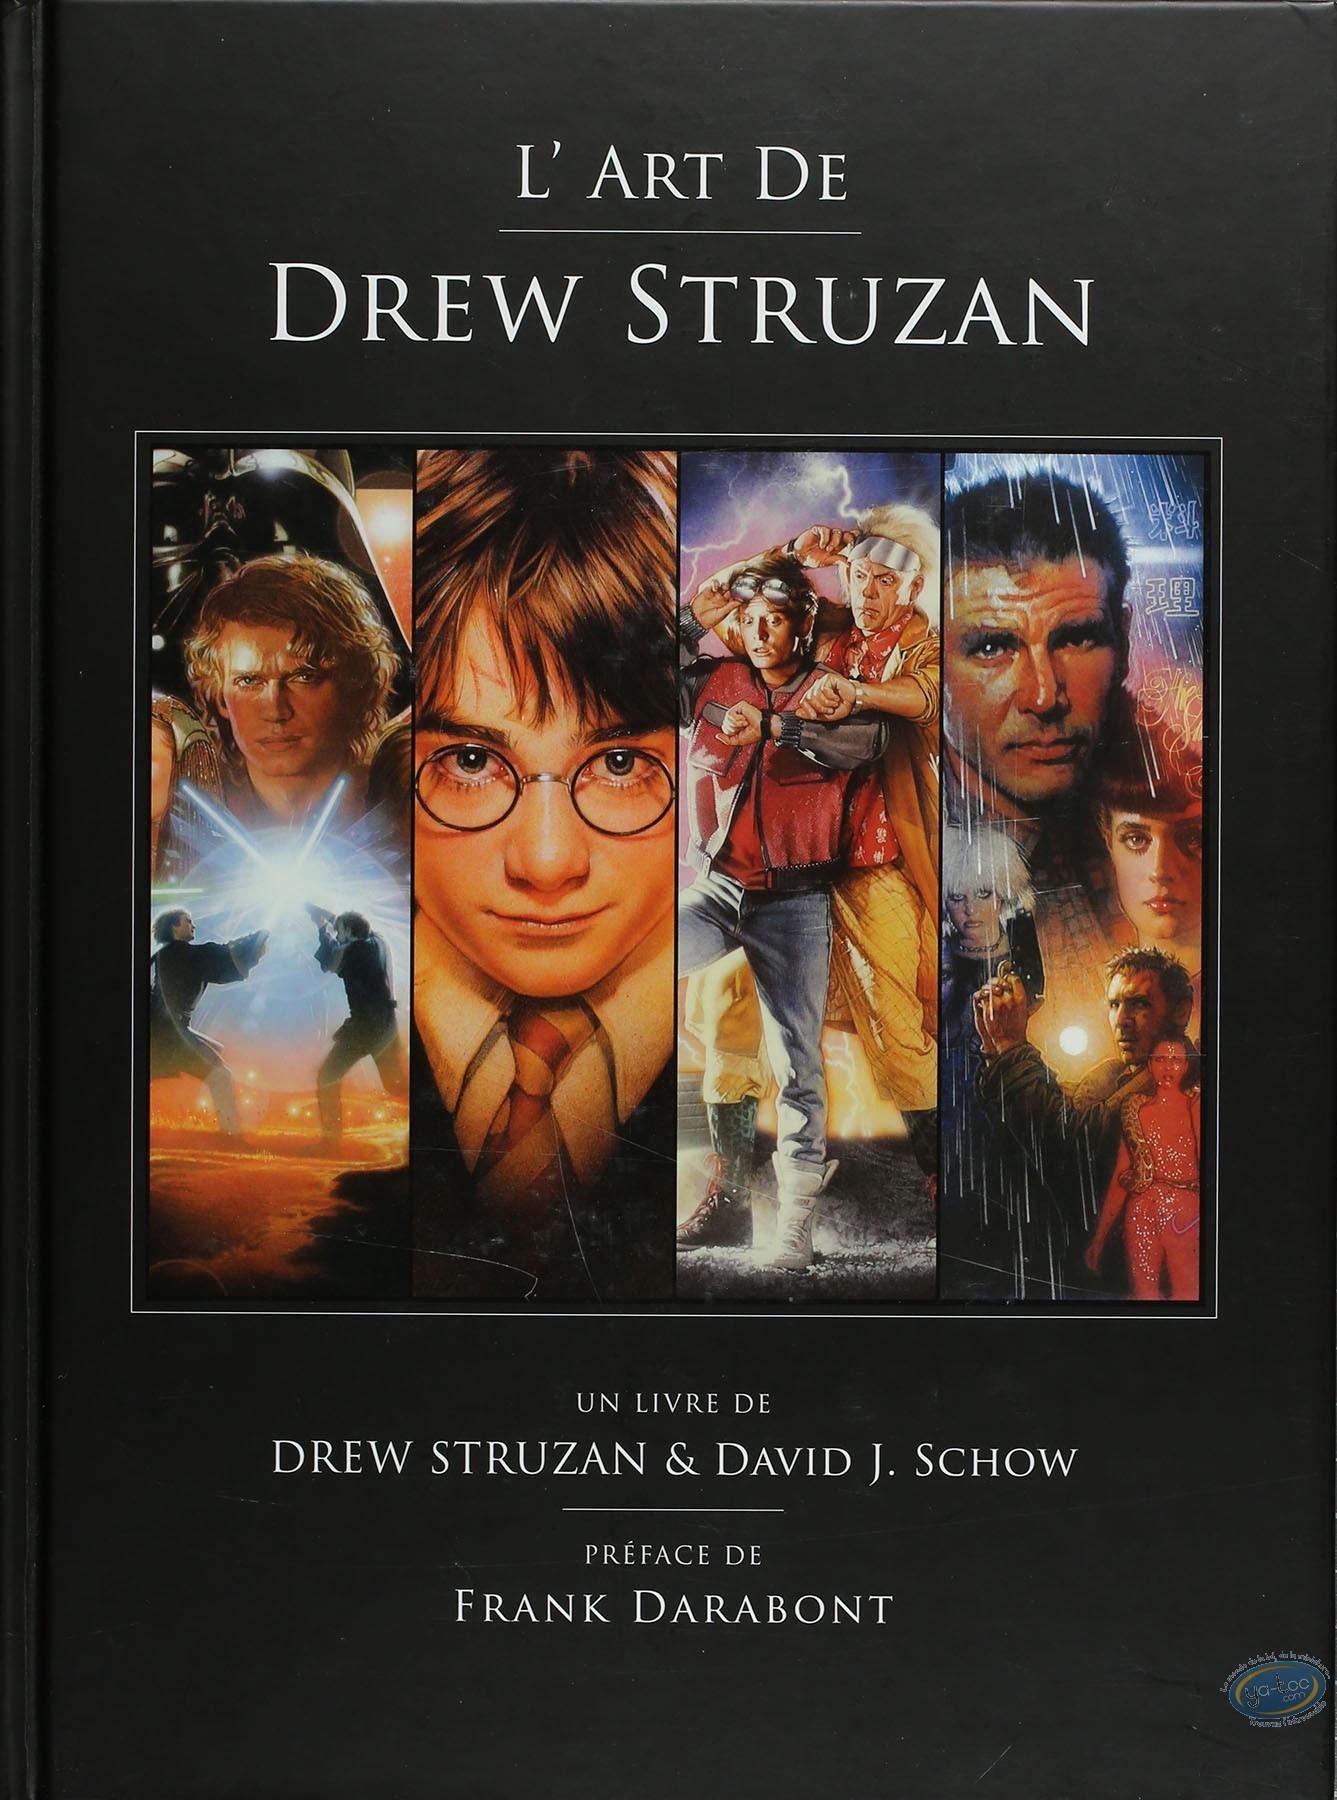 Book, Art de Drew Stuzan (L') : L'art de Drew Struzan